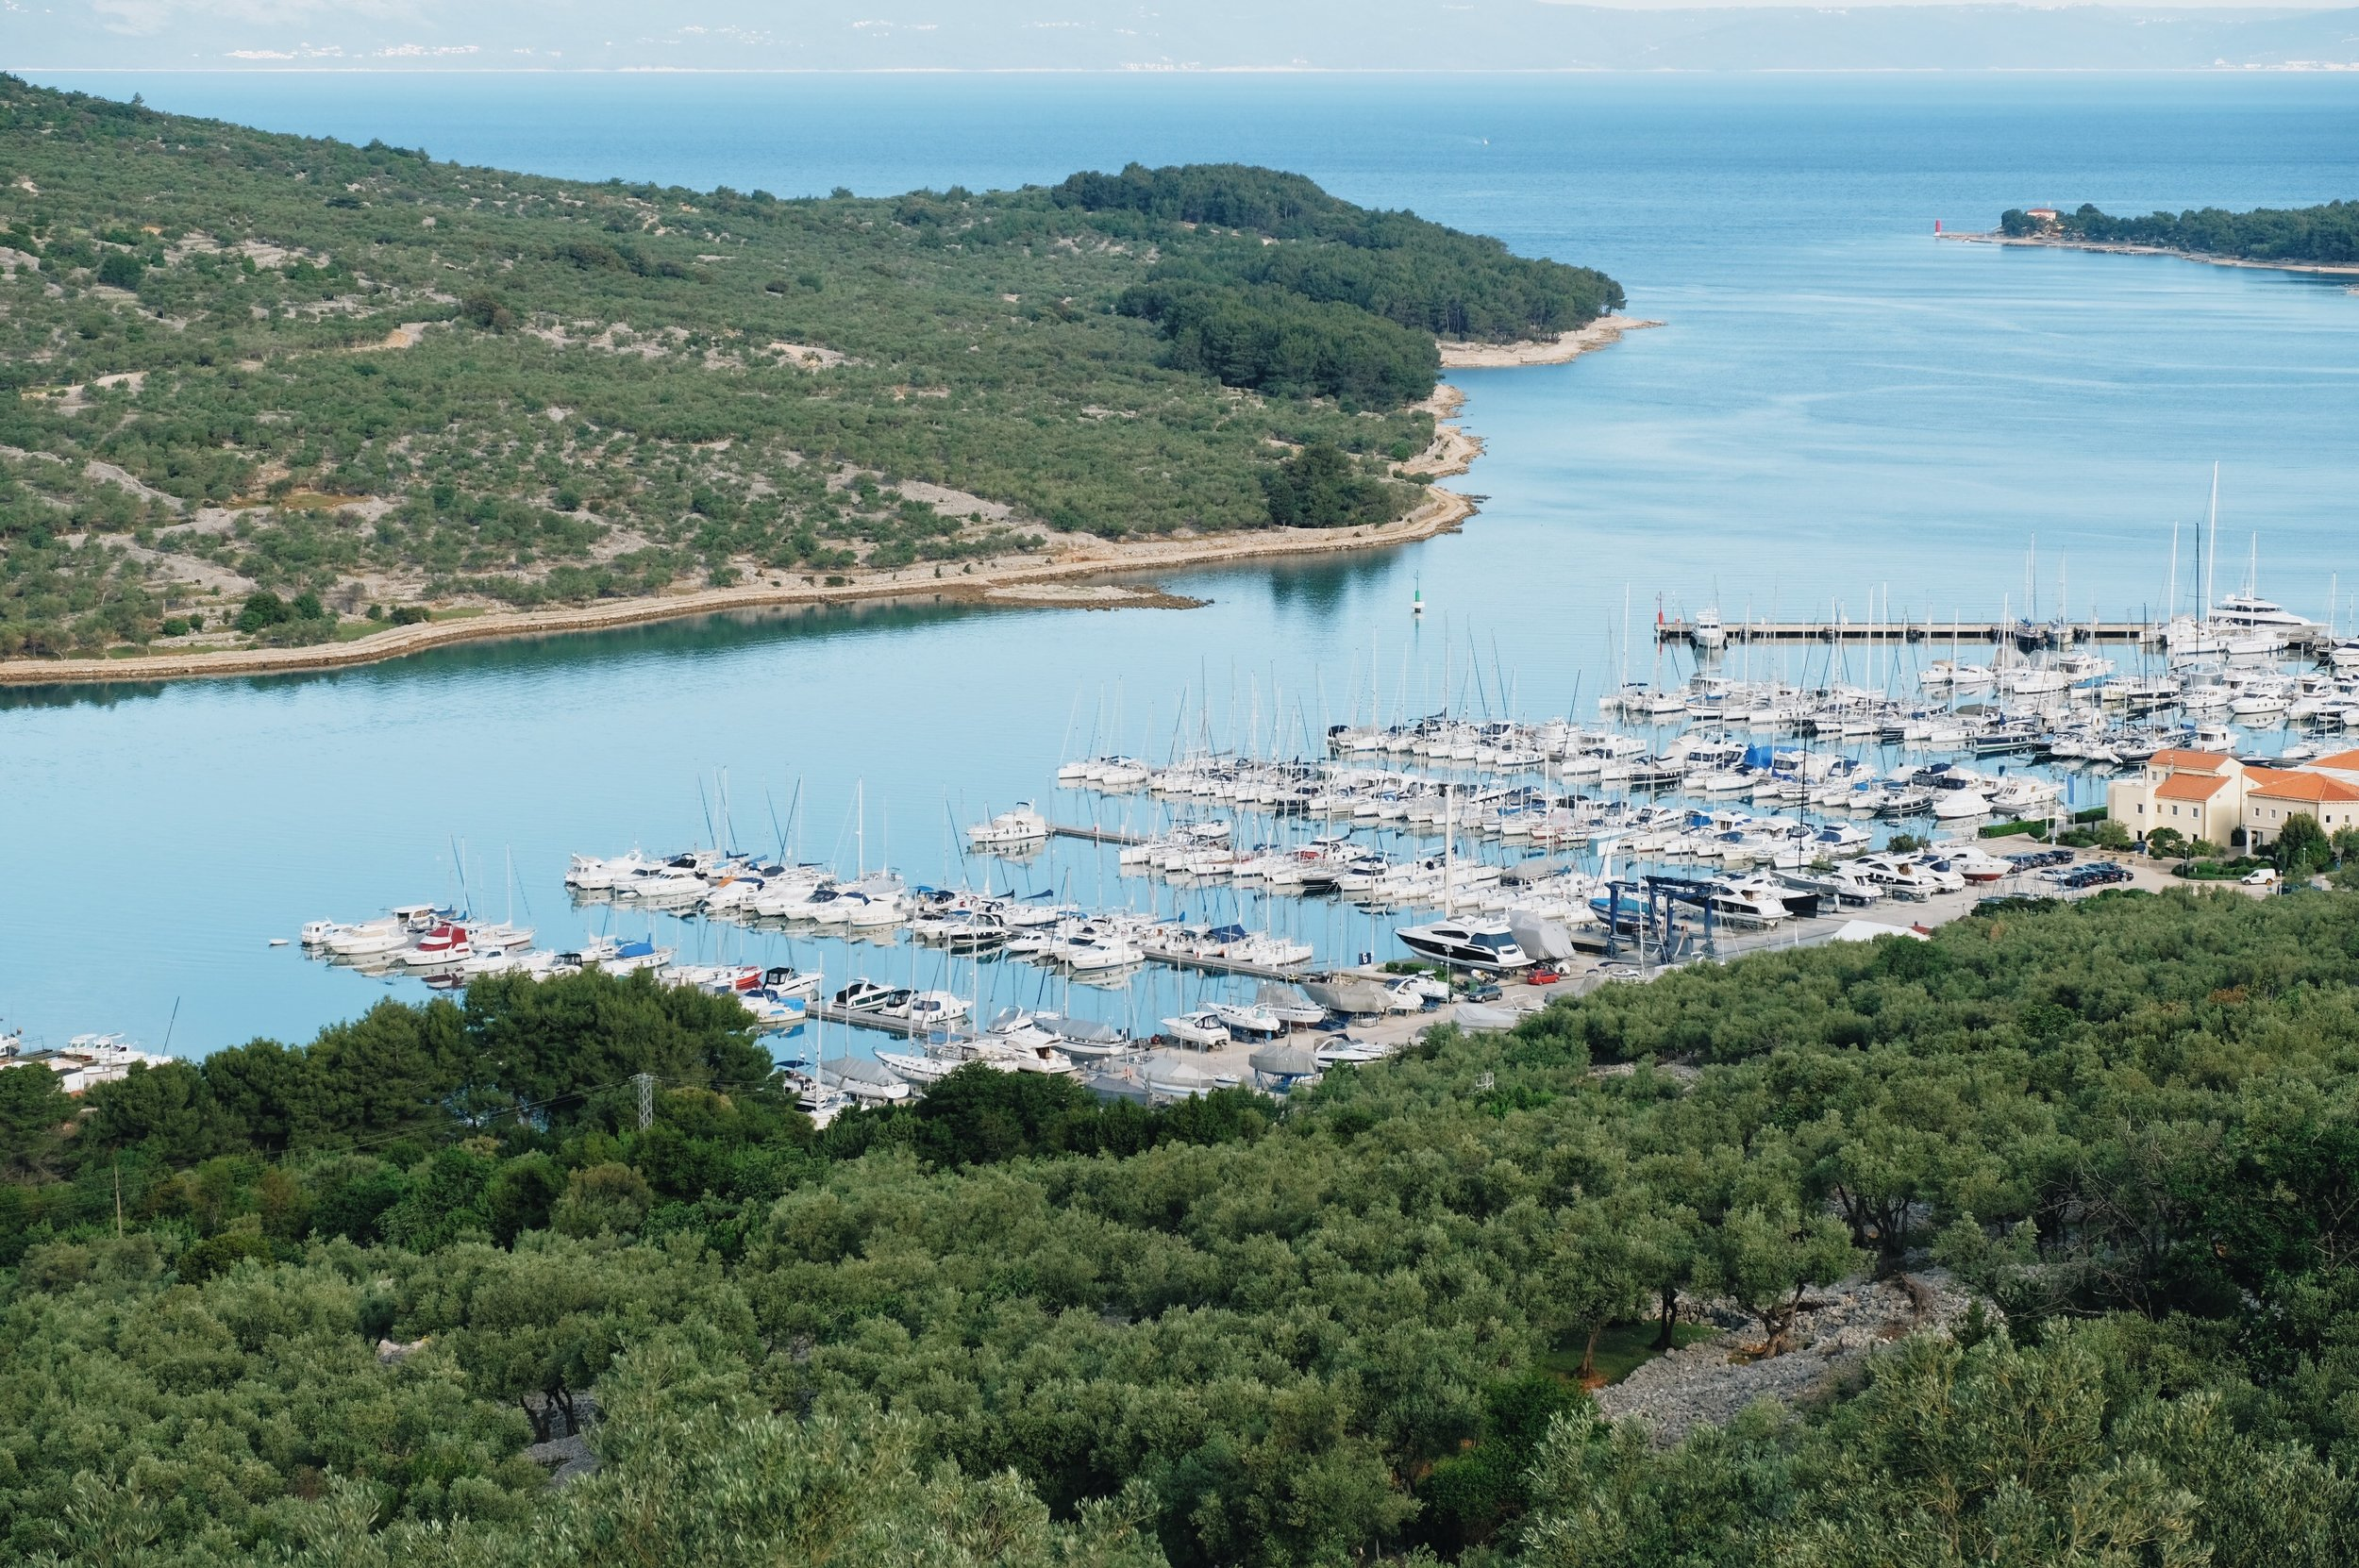 fat-creative-blog-2017-05-Unique-travel-destination- croatian-kvarner-region-cres-losinj-18.JPG